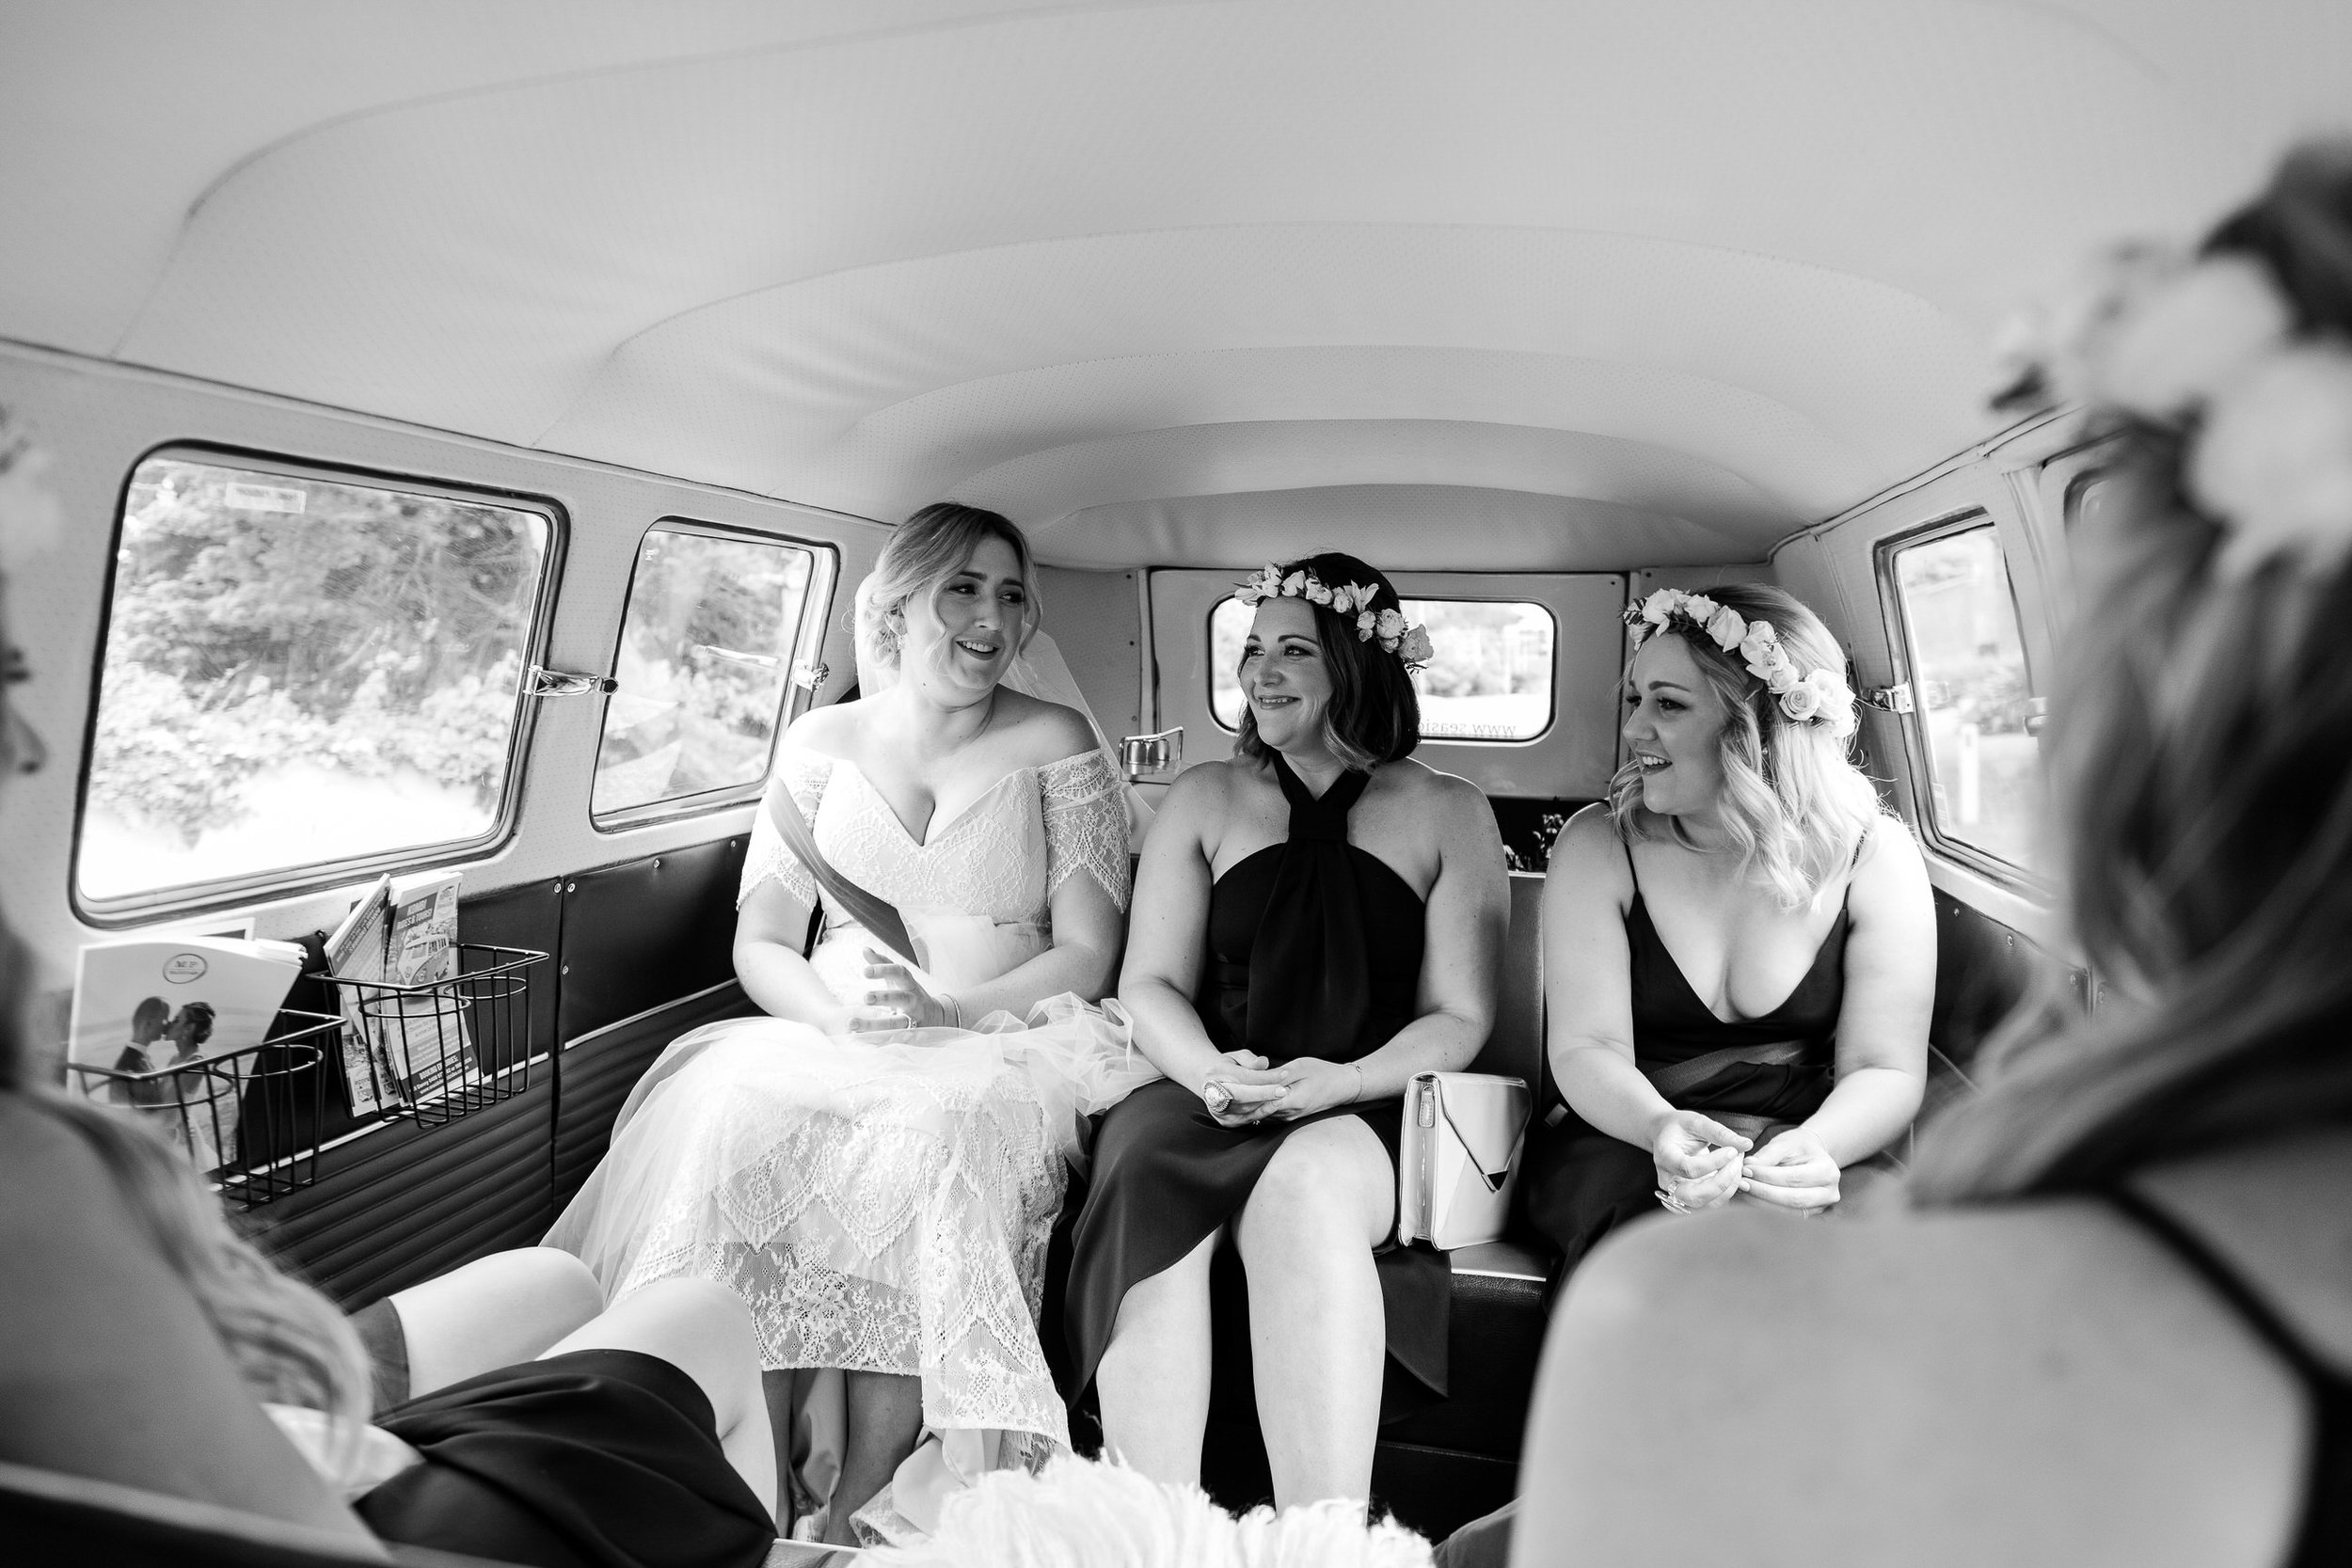 Justin_And_Jim_Photography_Portsea_Pub_Wedding32.JPG